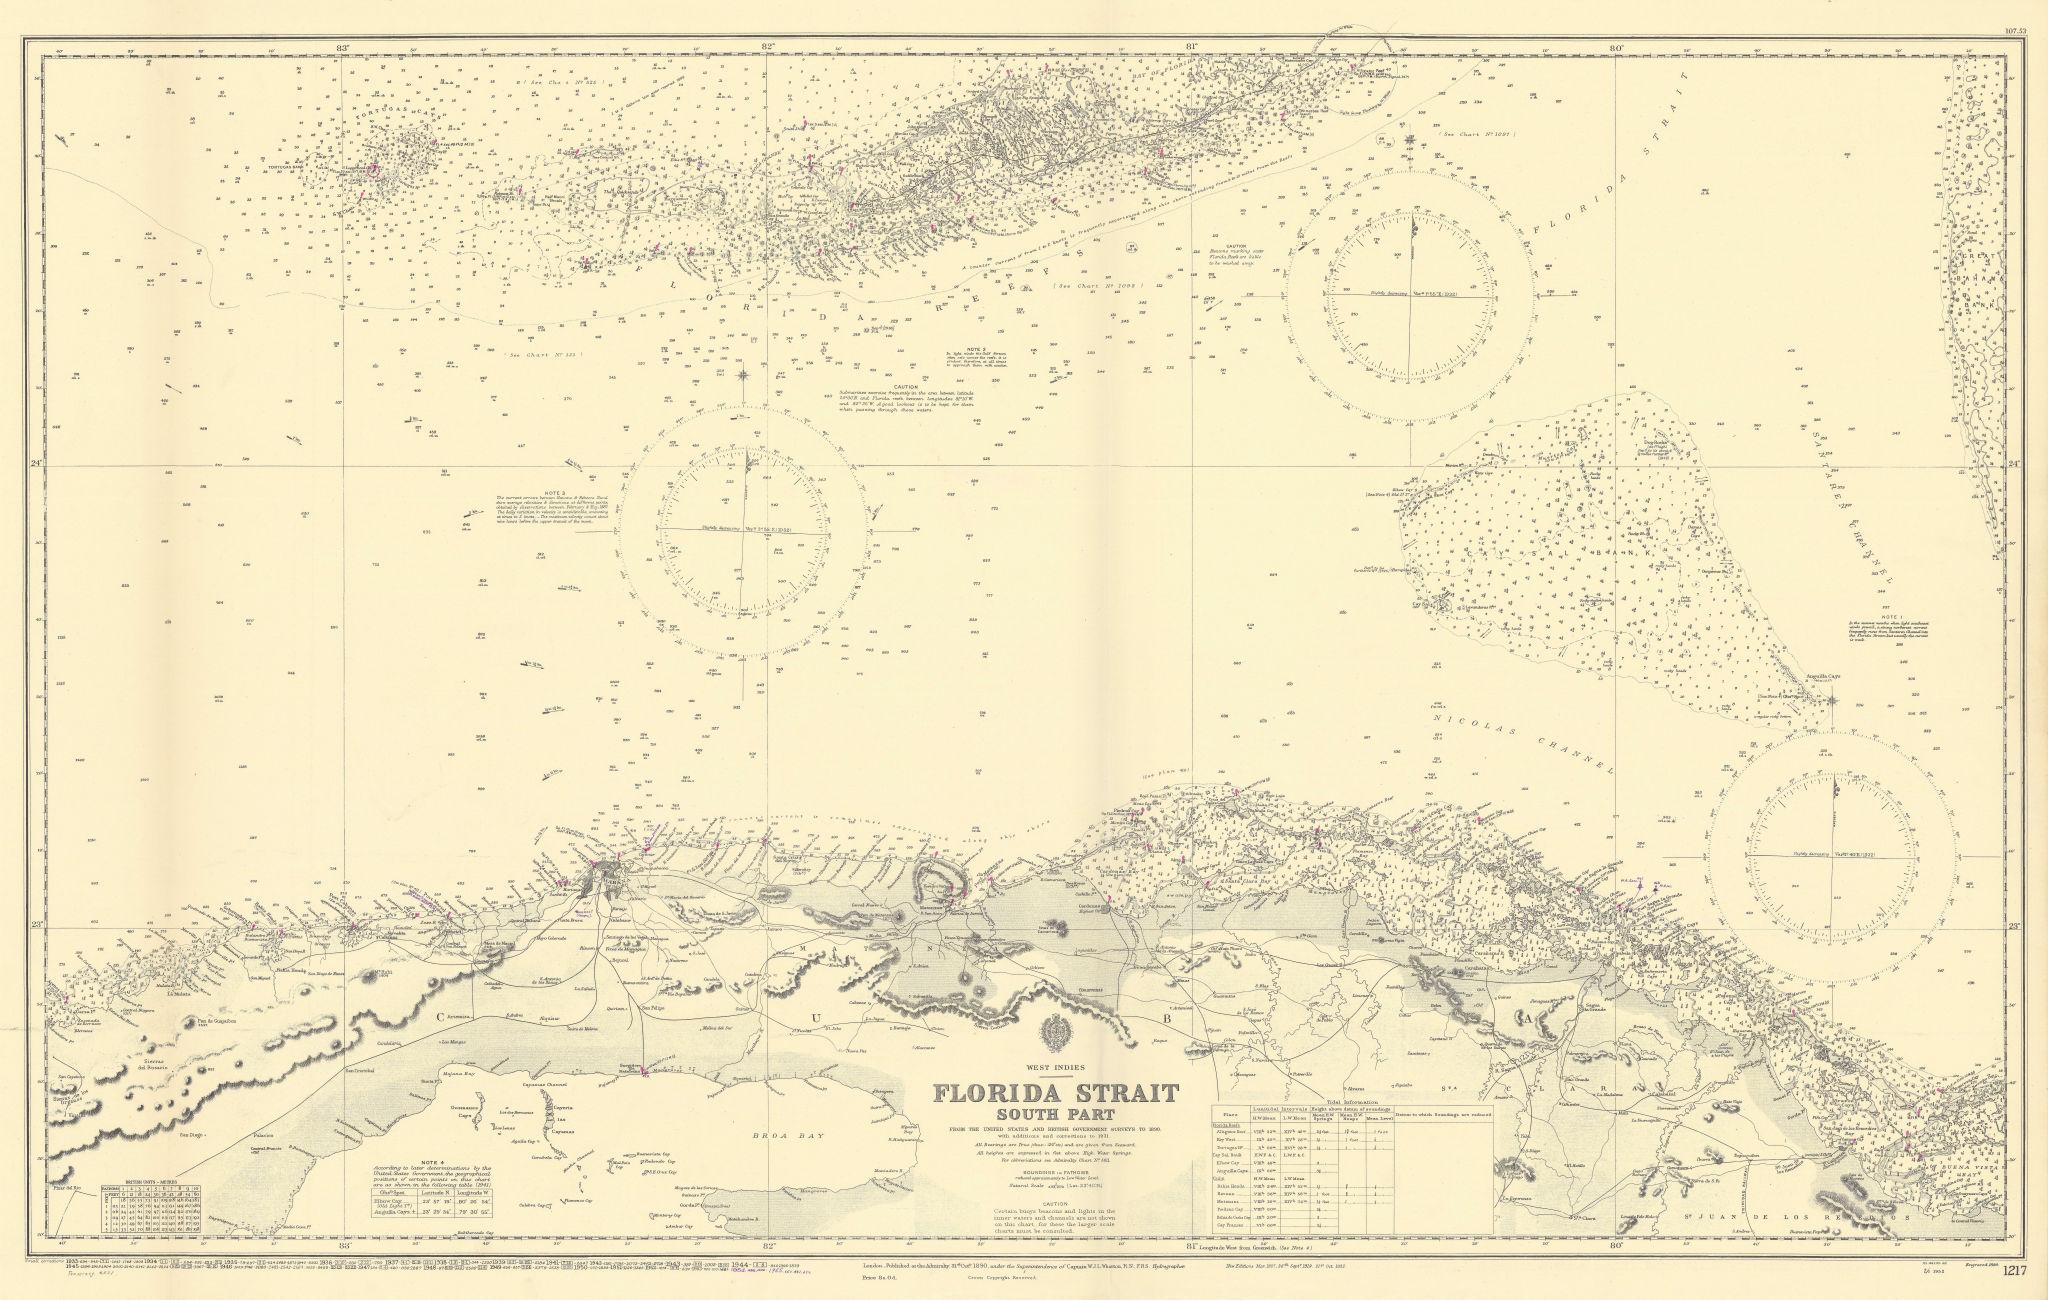 Florida Strait & Keys. Northern Cuba. ADMIRALTY sea chart 1890 (1955) old map